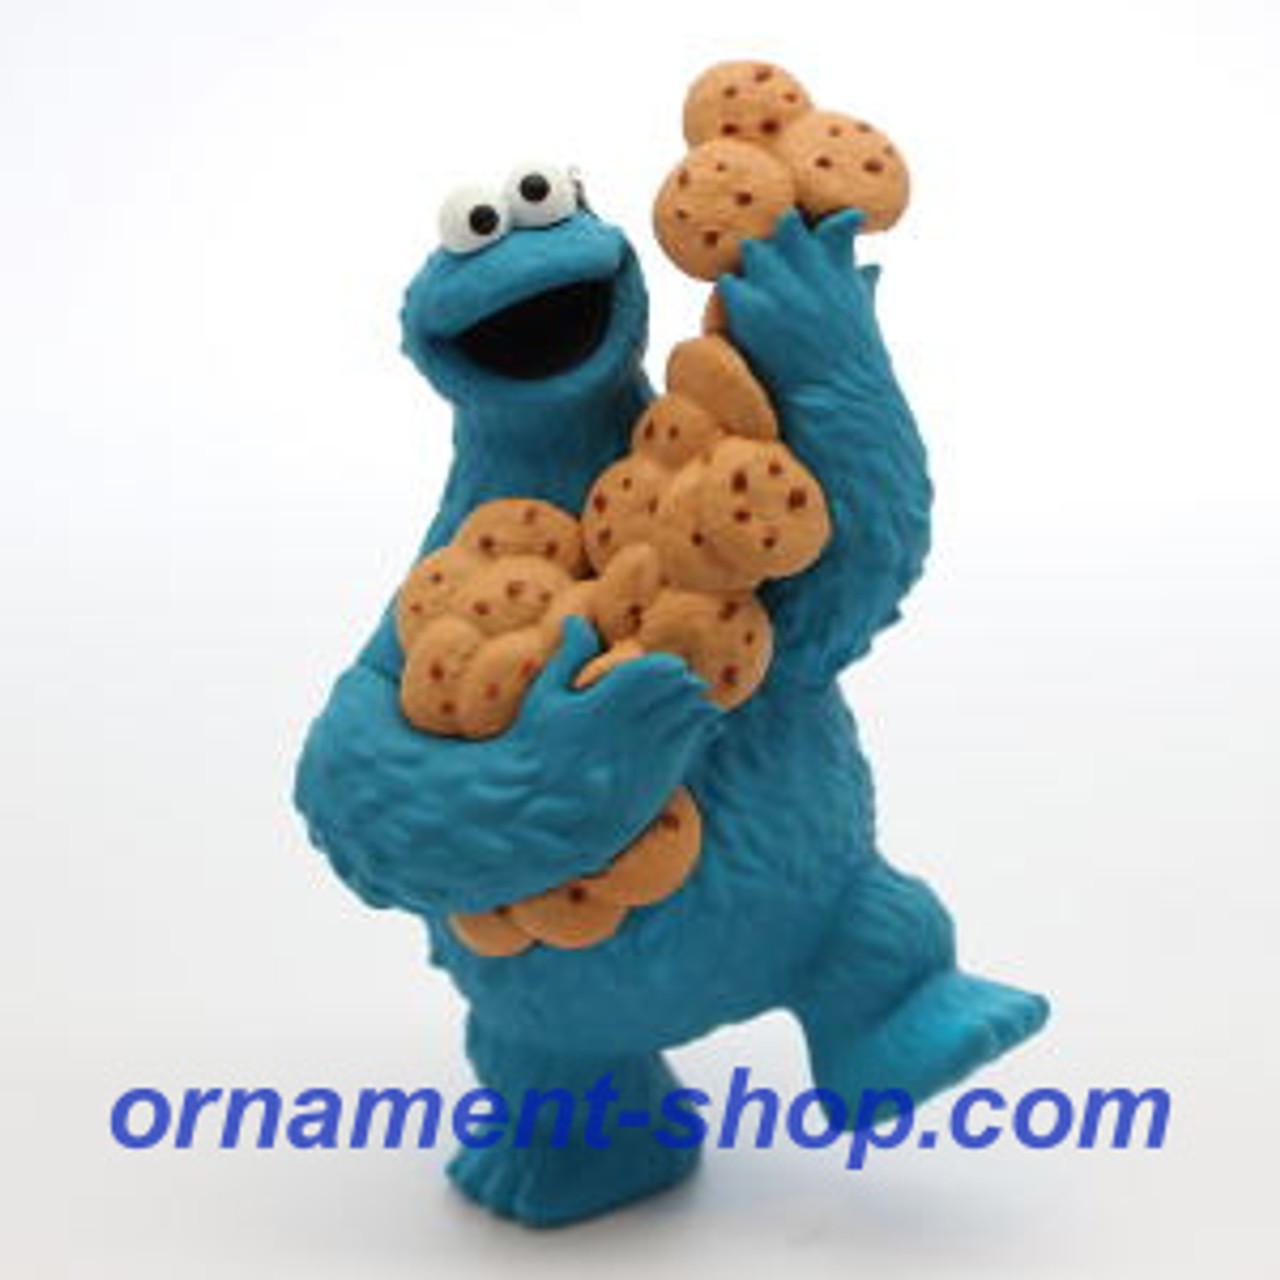 2019 Sesame Street Cookie Monster